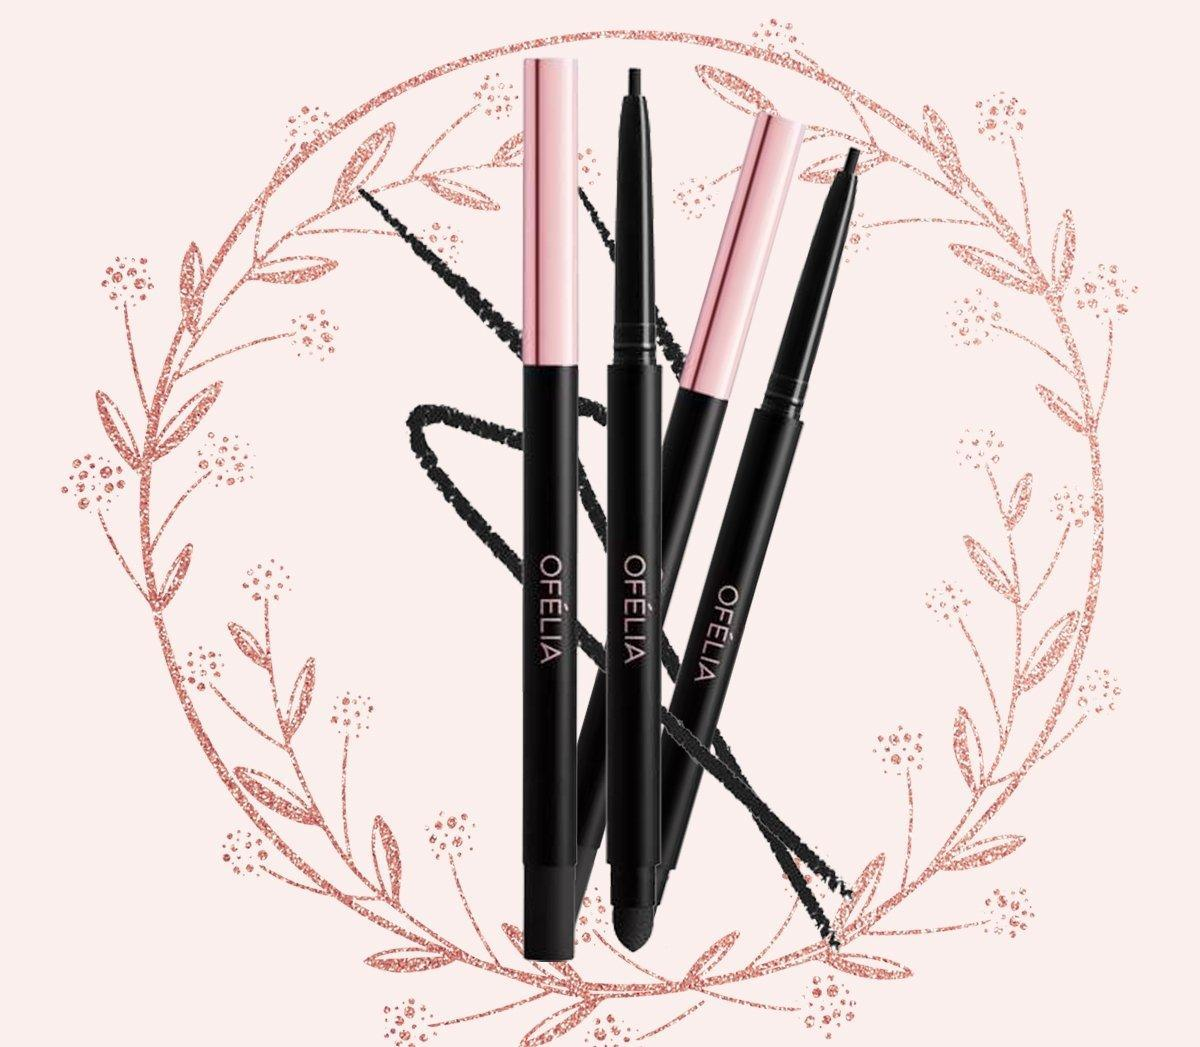 bút kẻ mắt dạng gel OFÉLIA Modern Gel Eyeliner (ảnh: Internet)